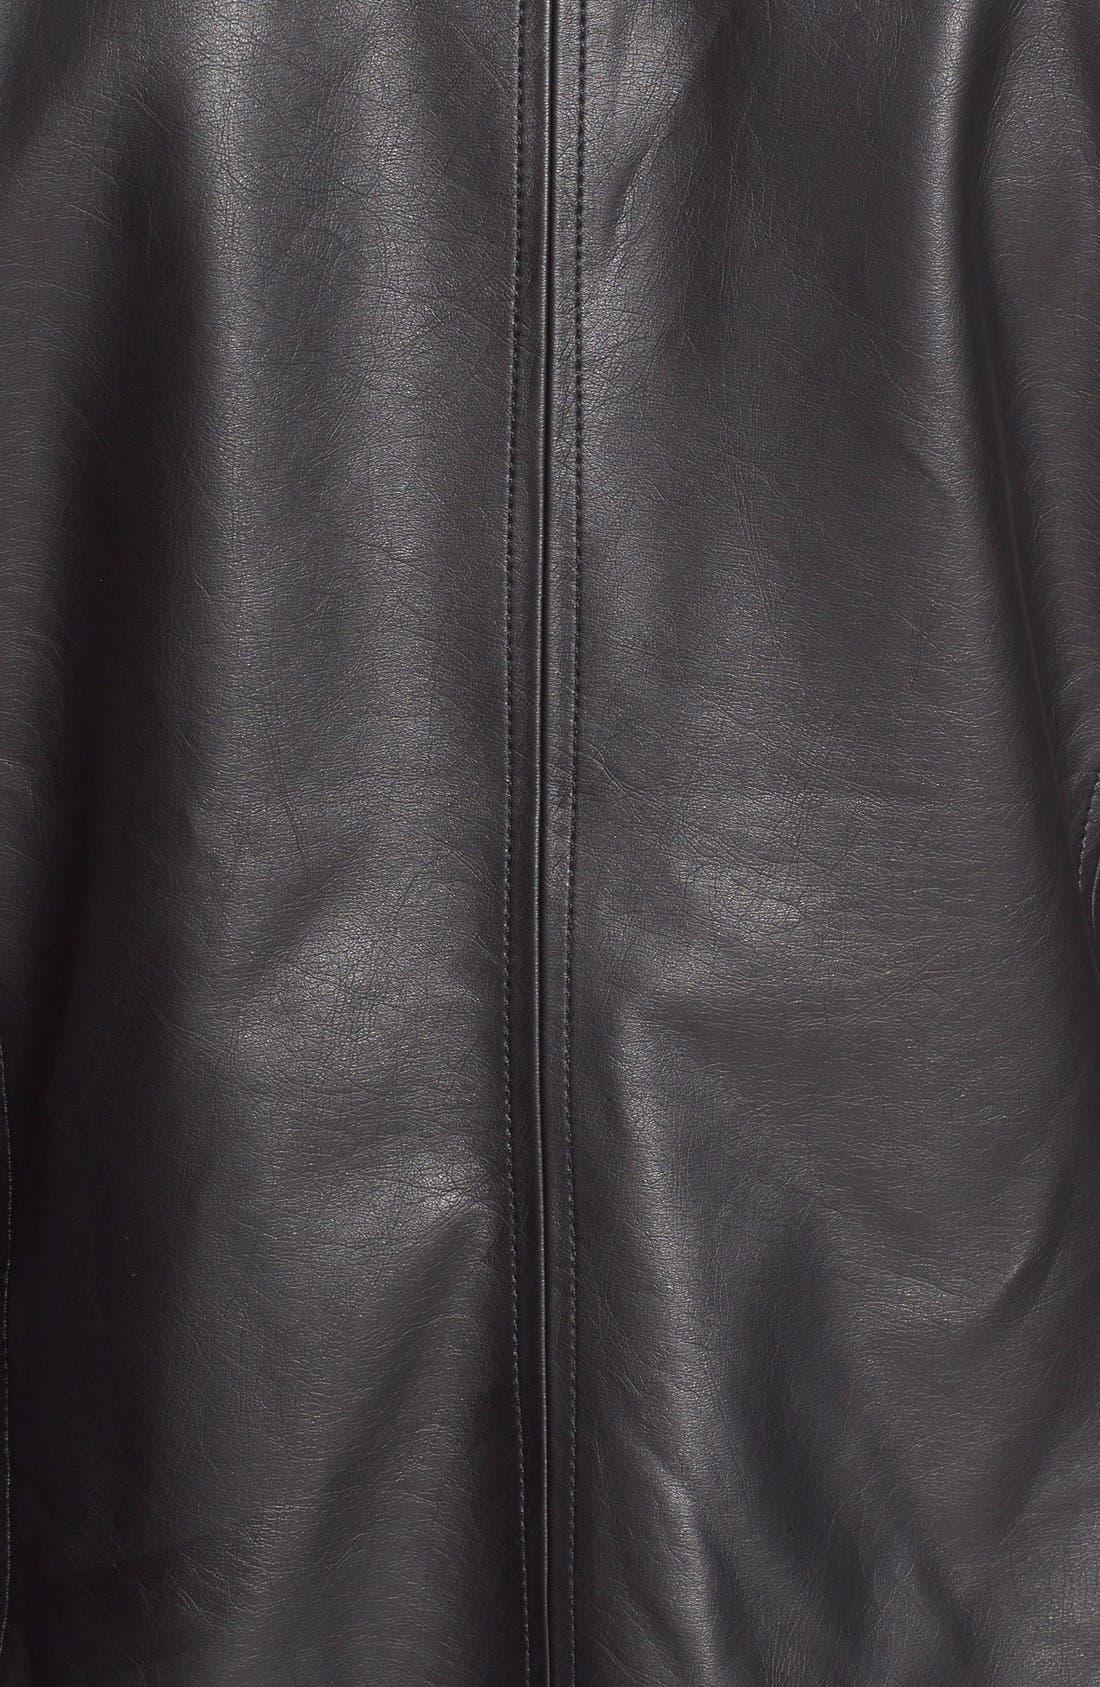 'Helena' Faux Leather Jacket,                             Alternate thumbnail 4, color,                             001